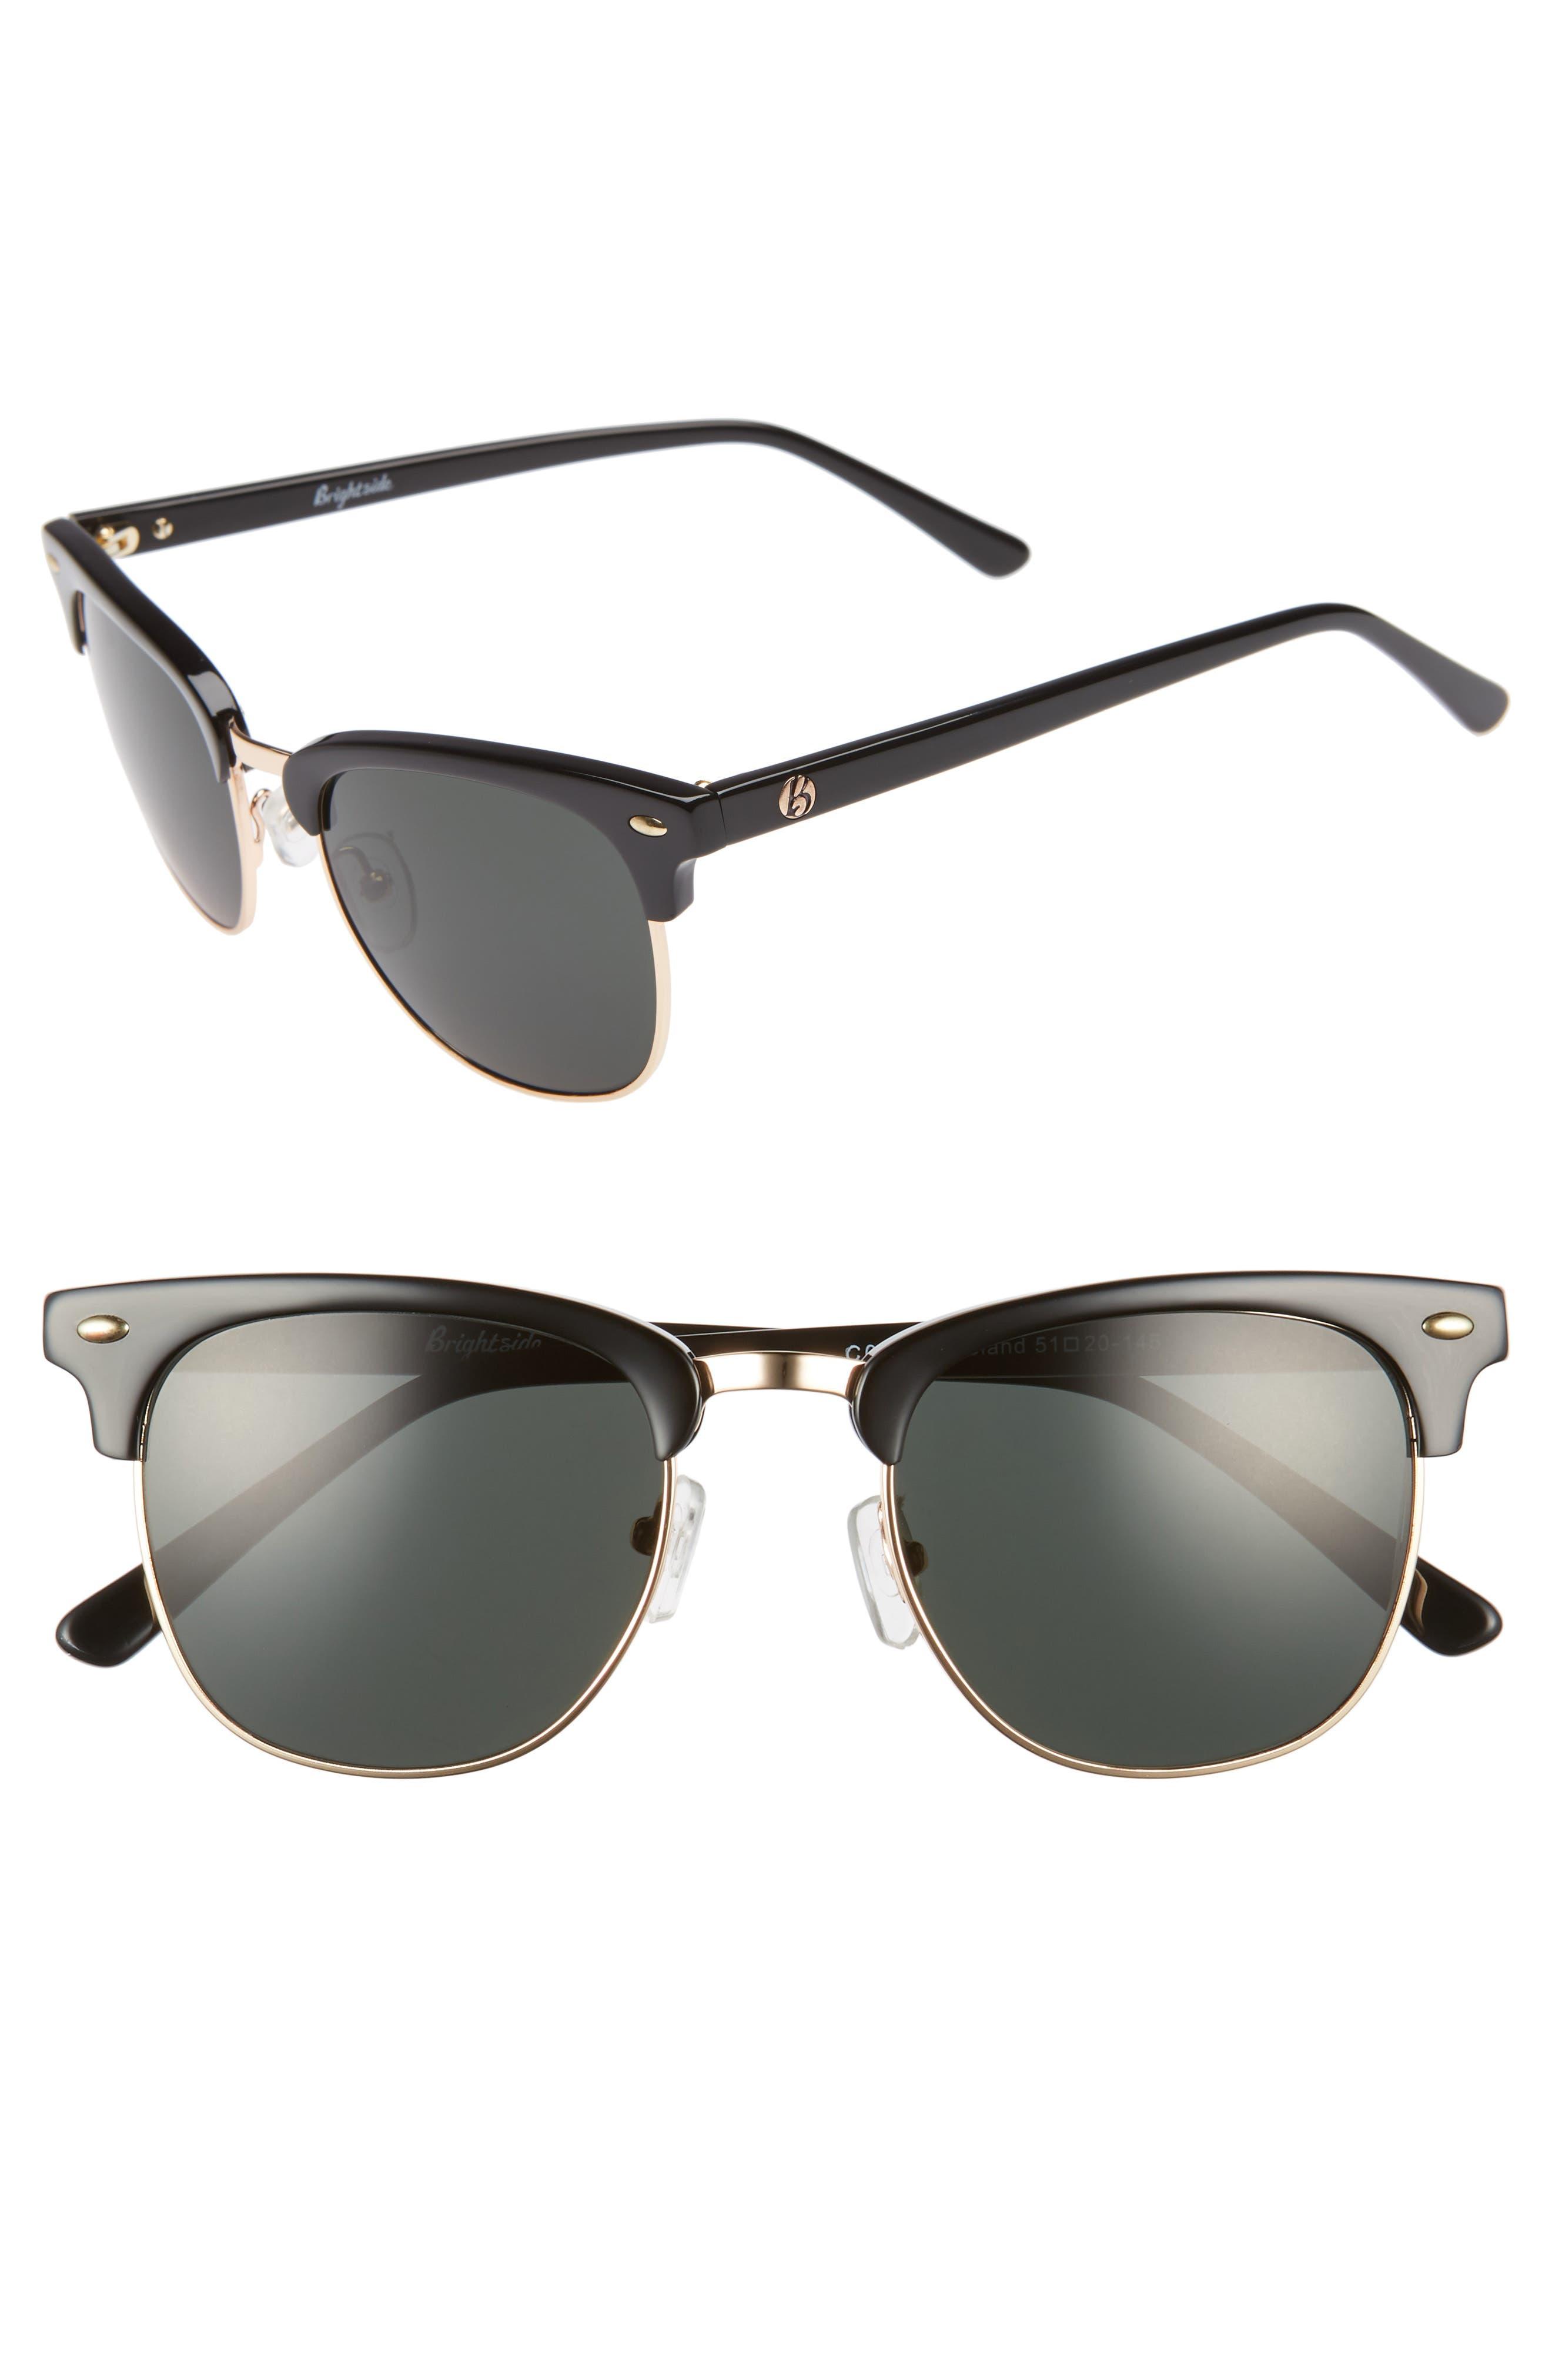 Copeland 51mm Sunglasses,                             Main thumbnail 1, color,                             BLACK/ GREY